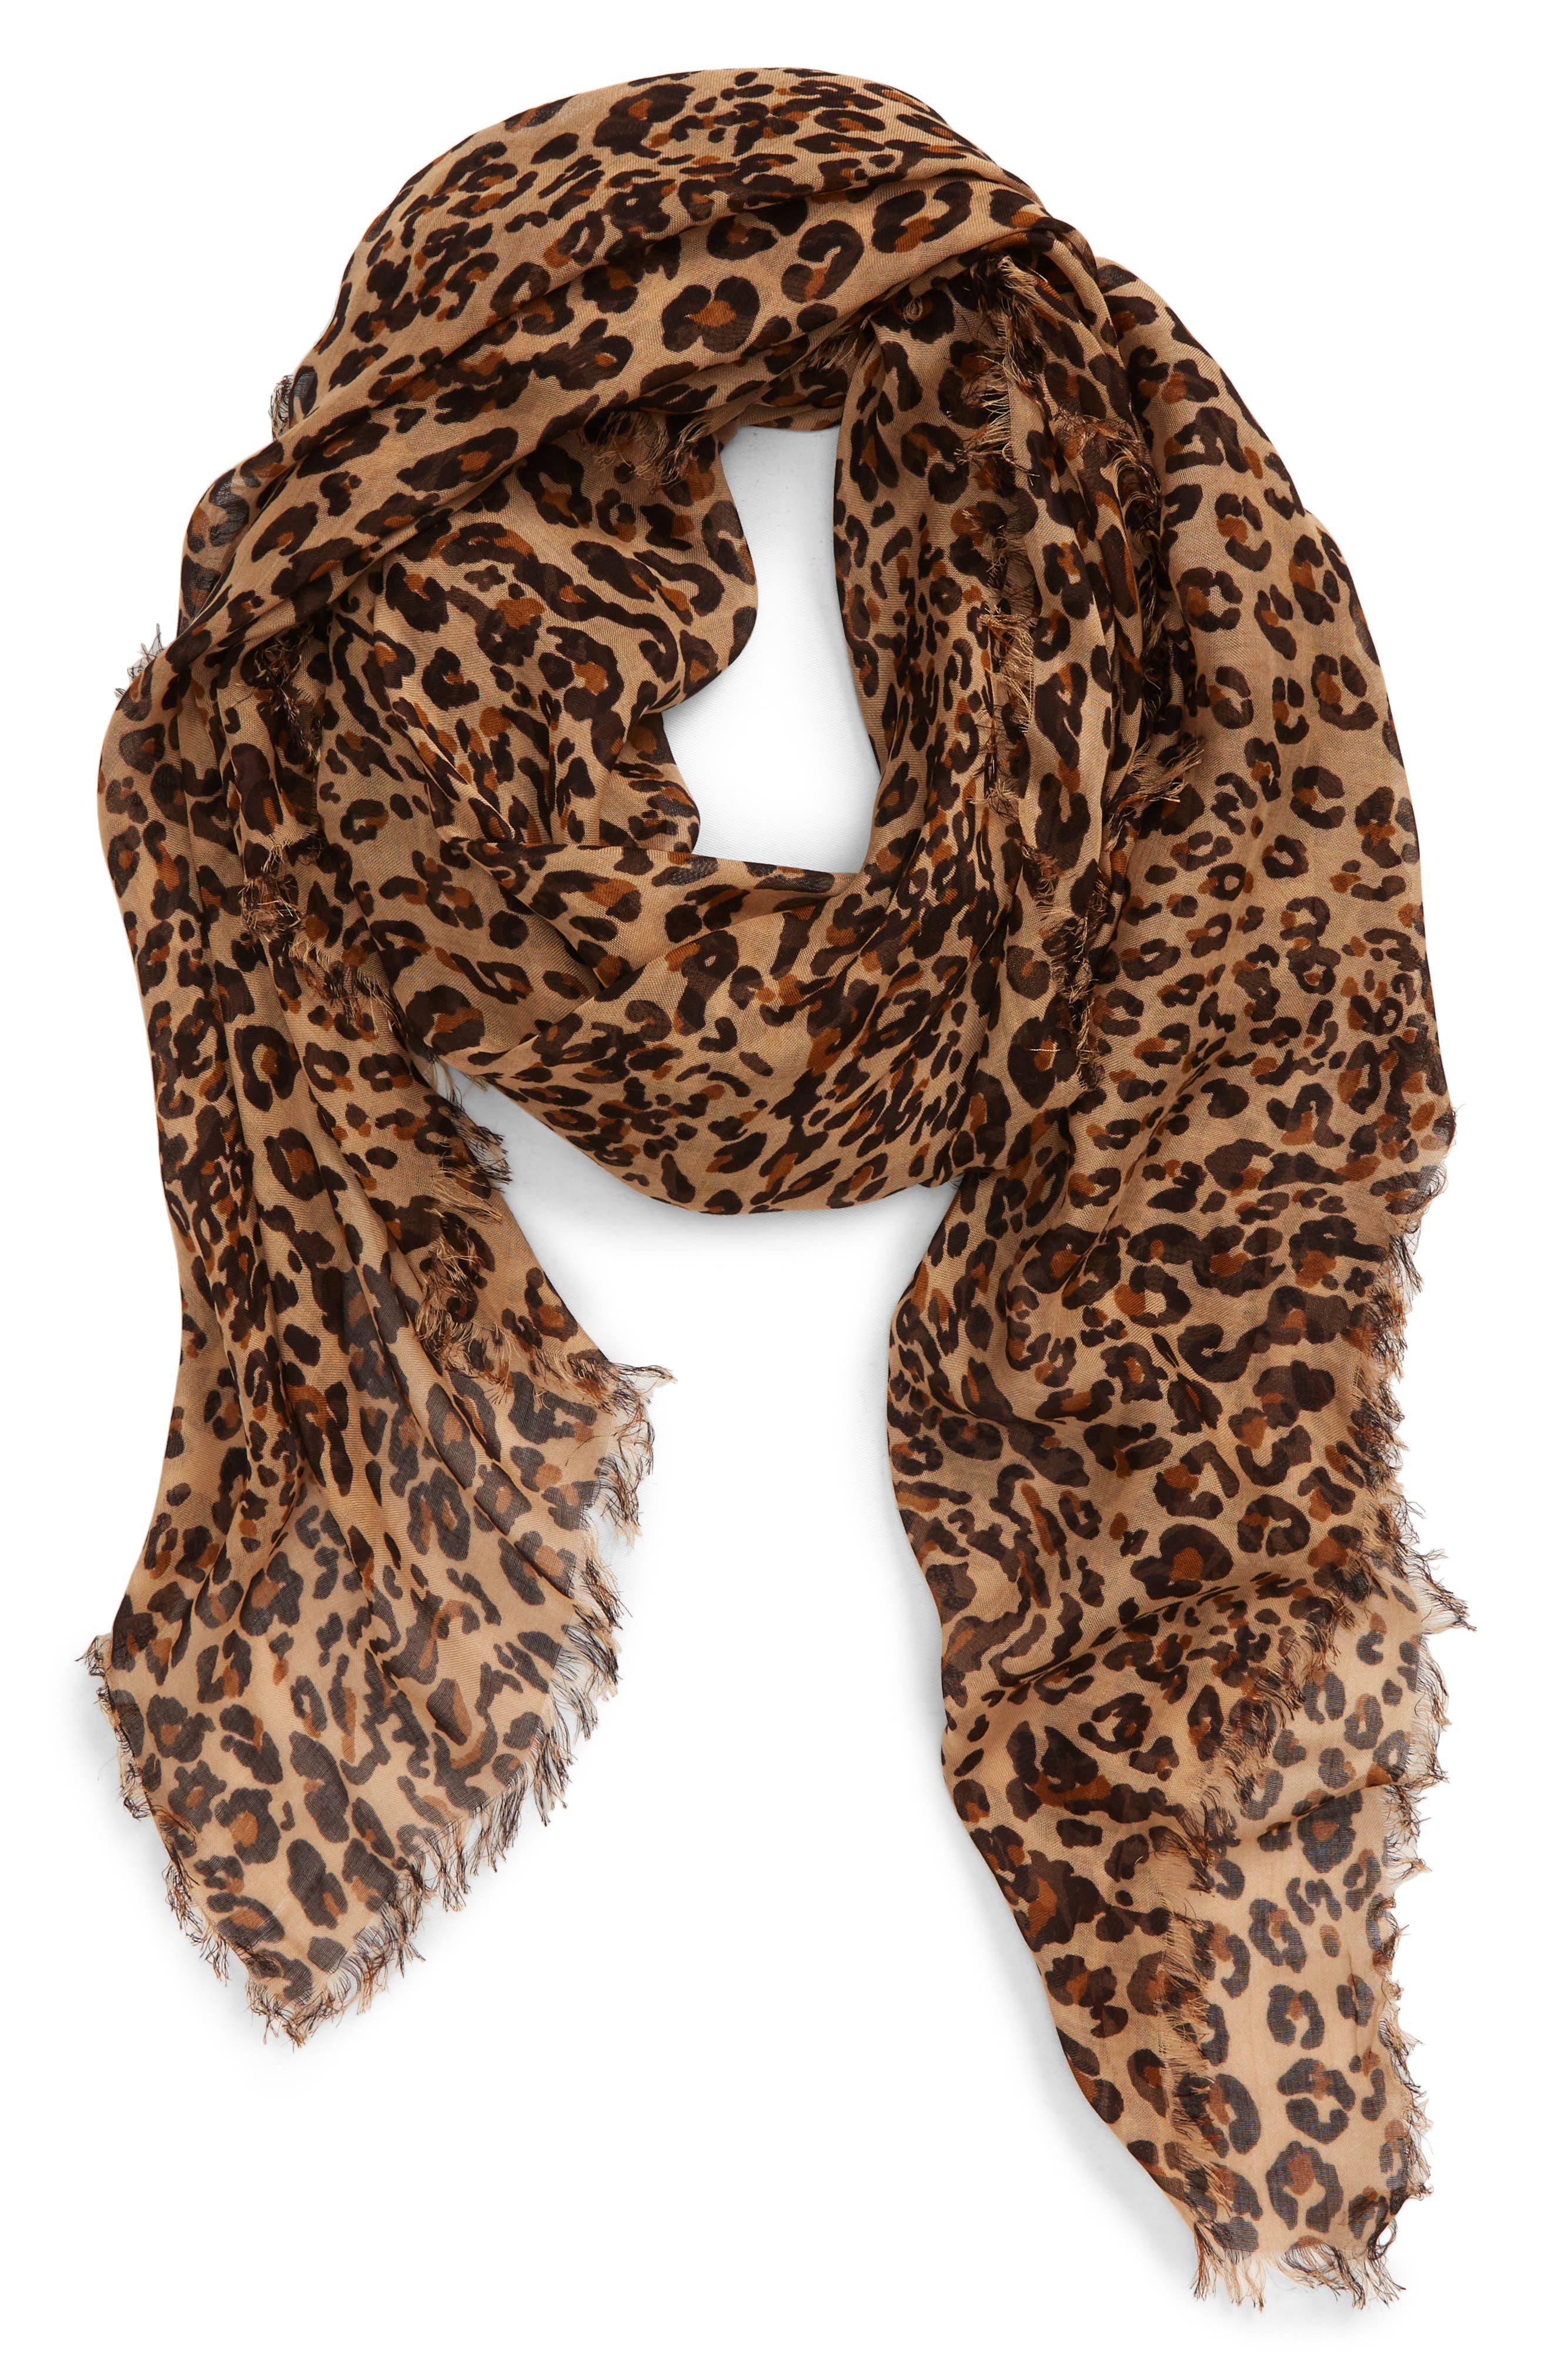 Grey Leopard Print Scarf Black Pink Border Ladies Animal Shawl Wrap Scarves New